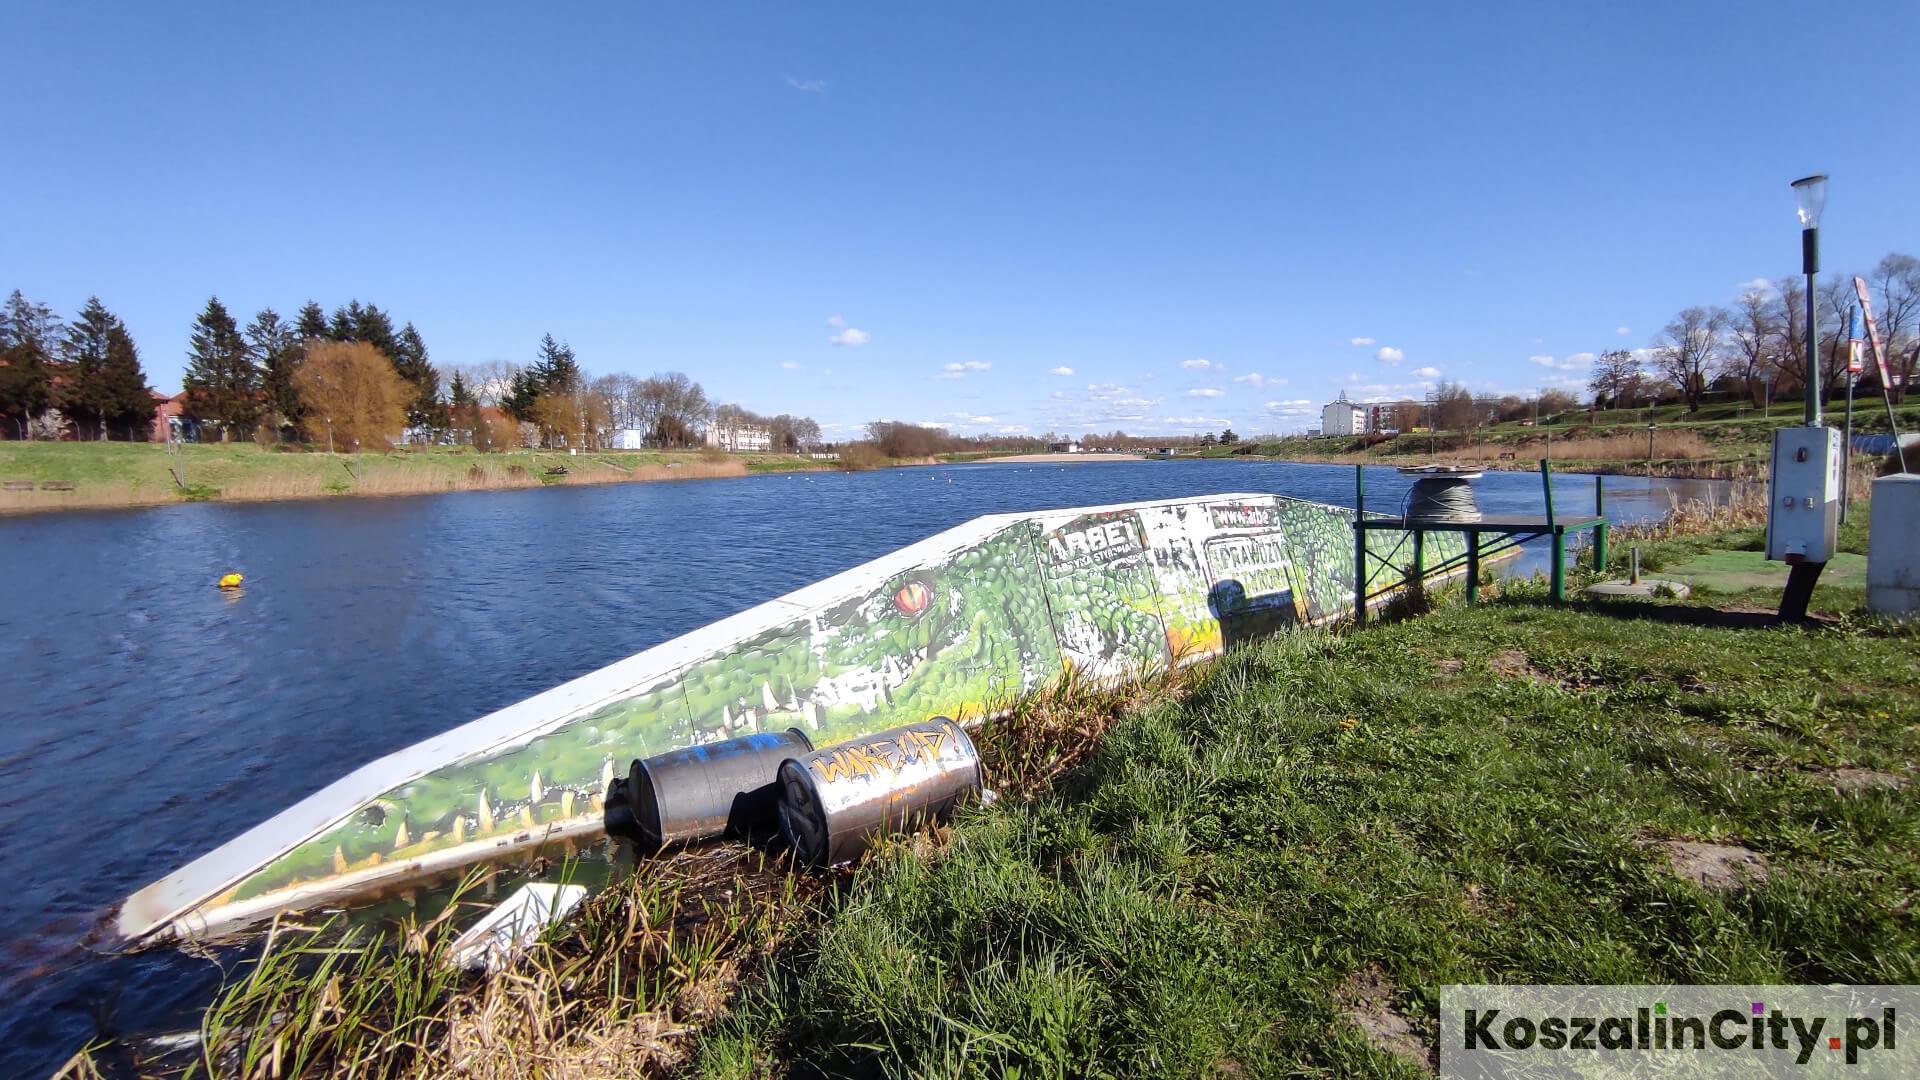 WakePark - Wodna Dolina - Koszalin